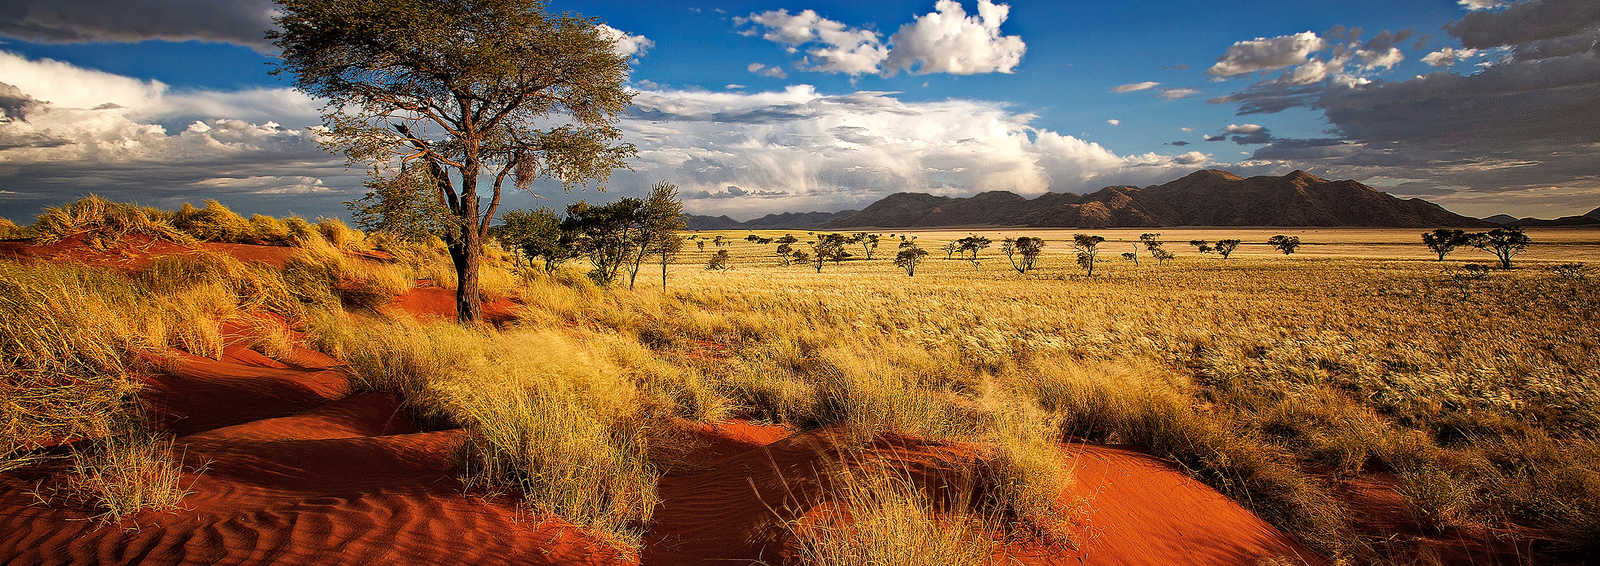 Naukluft reserve, namibia